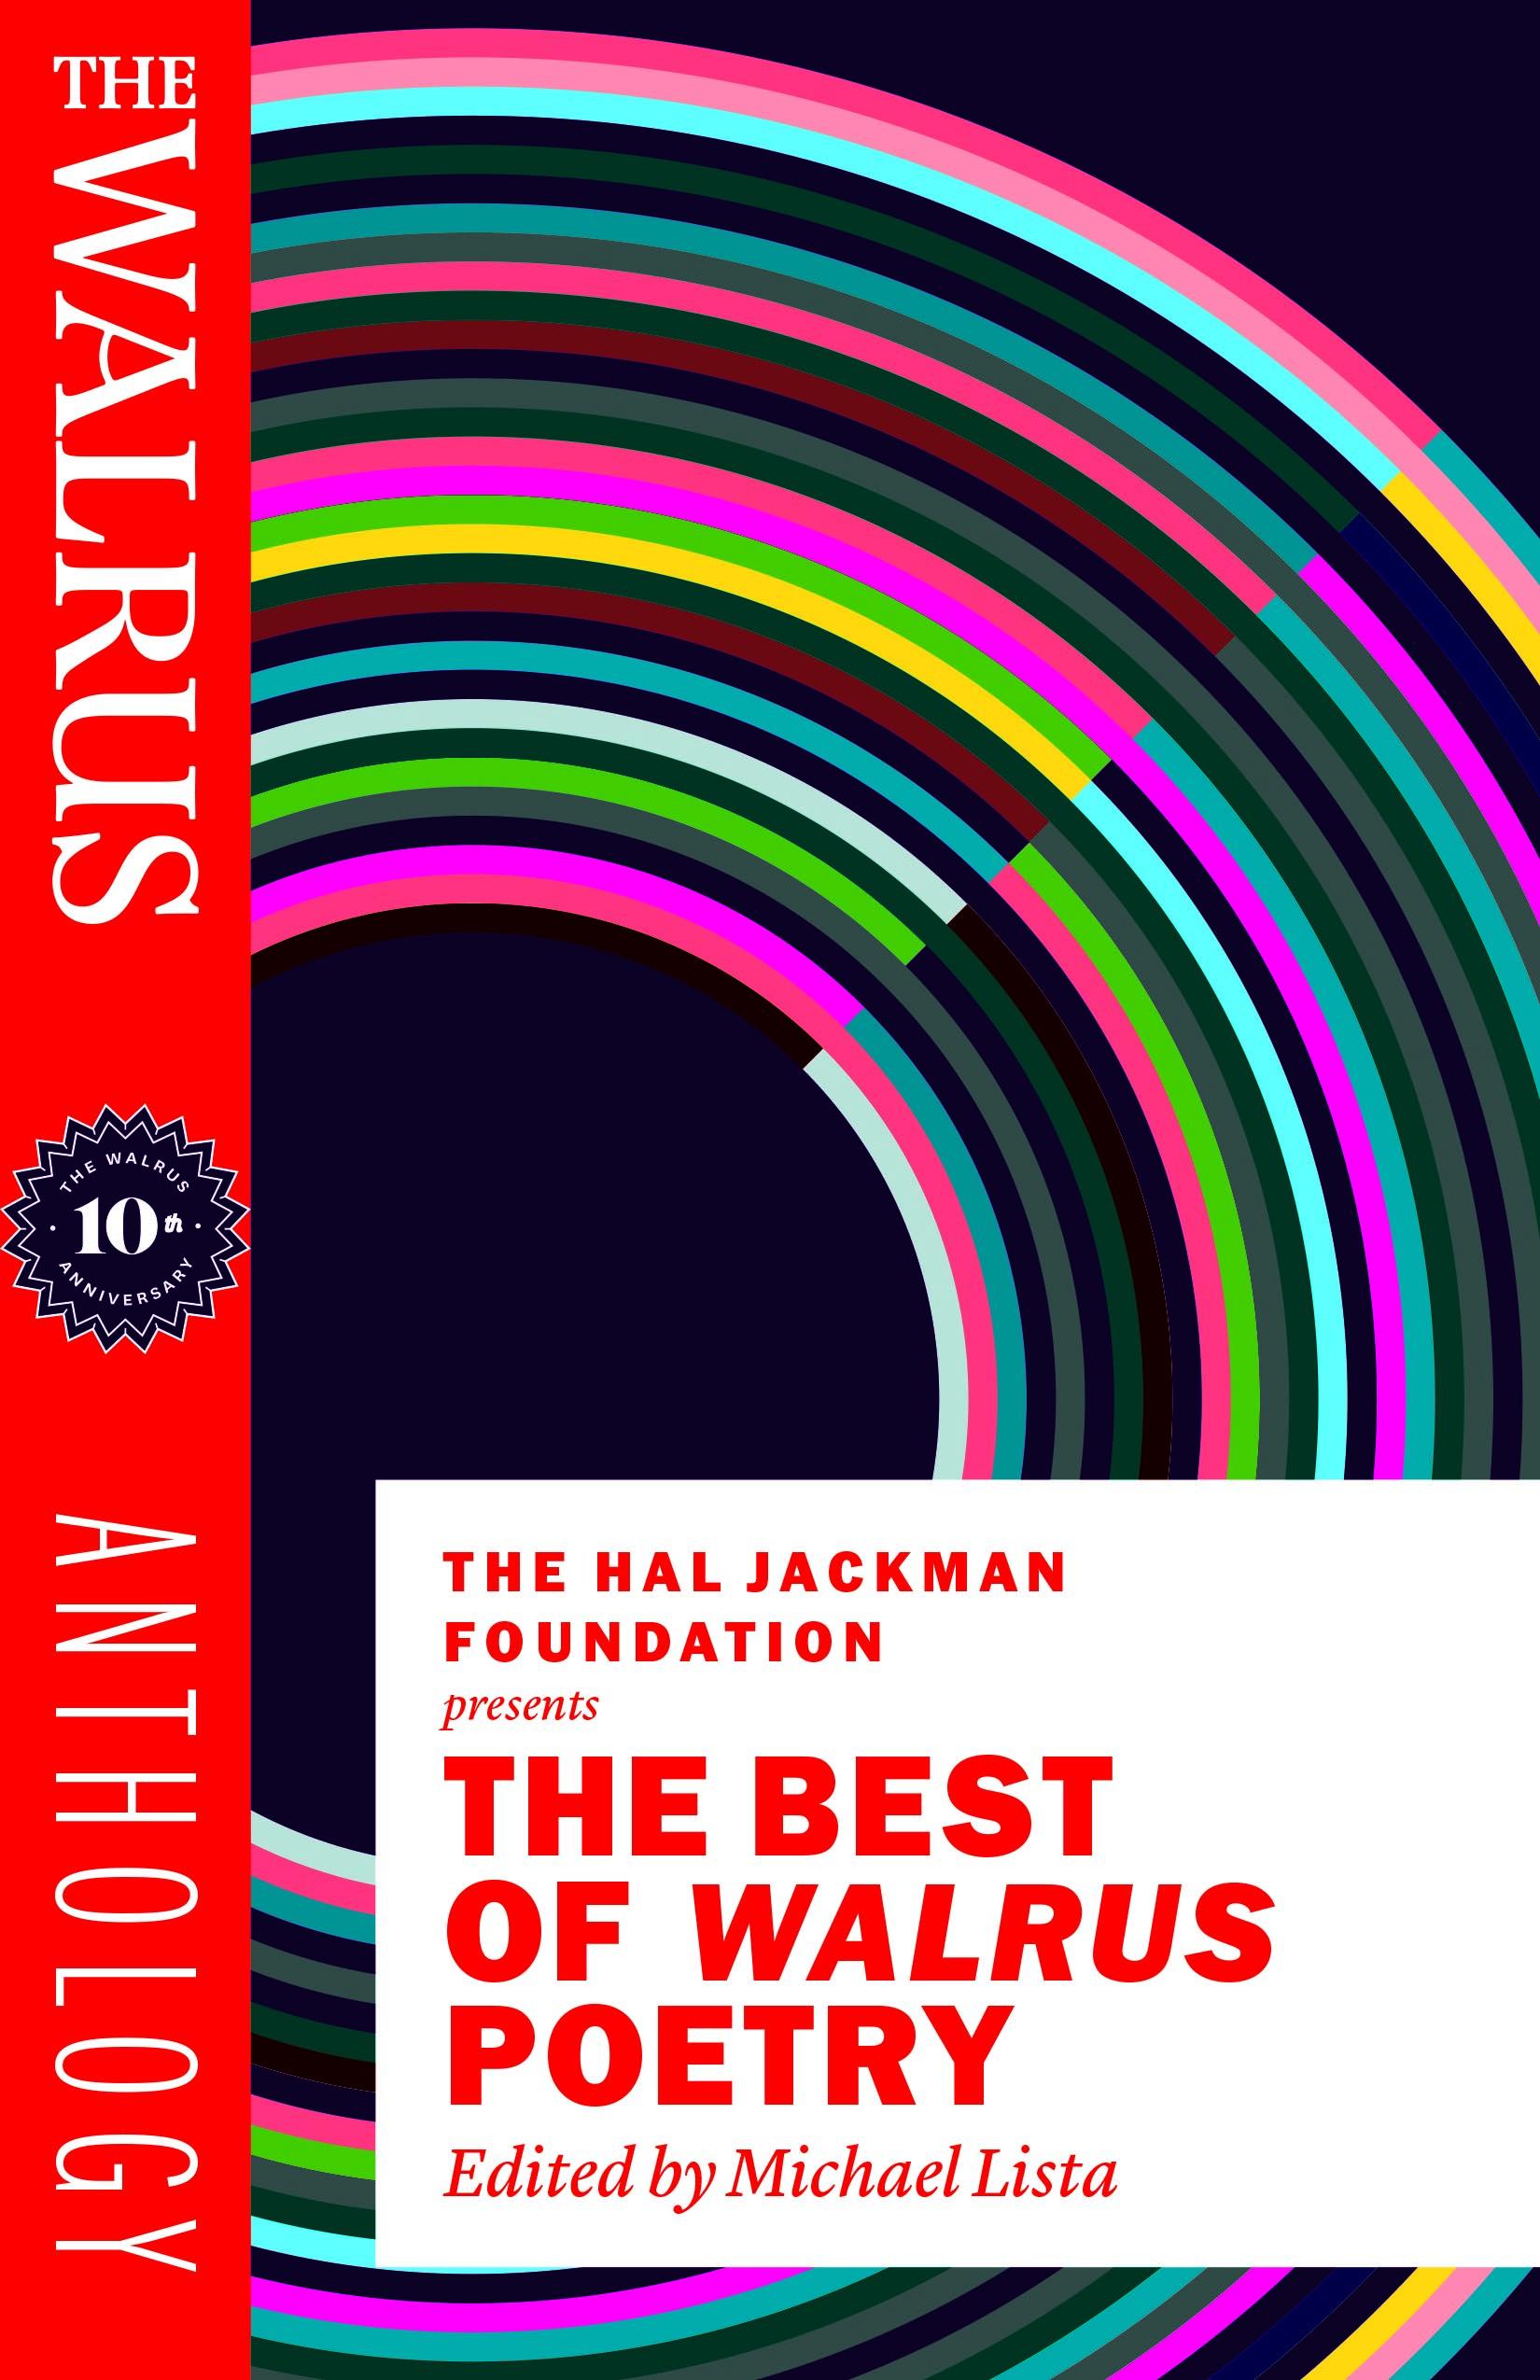 The Best of Walrus Poetry